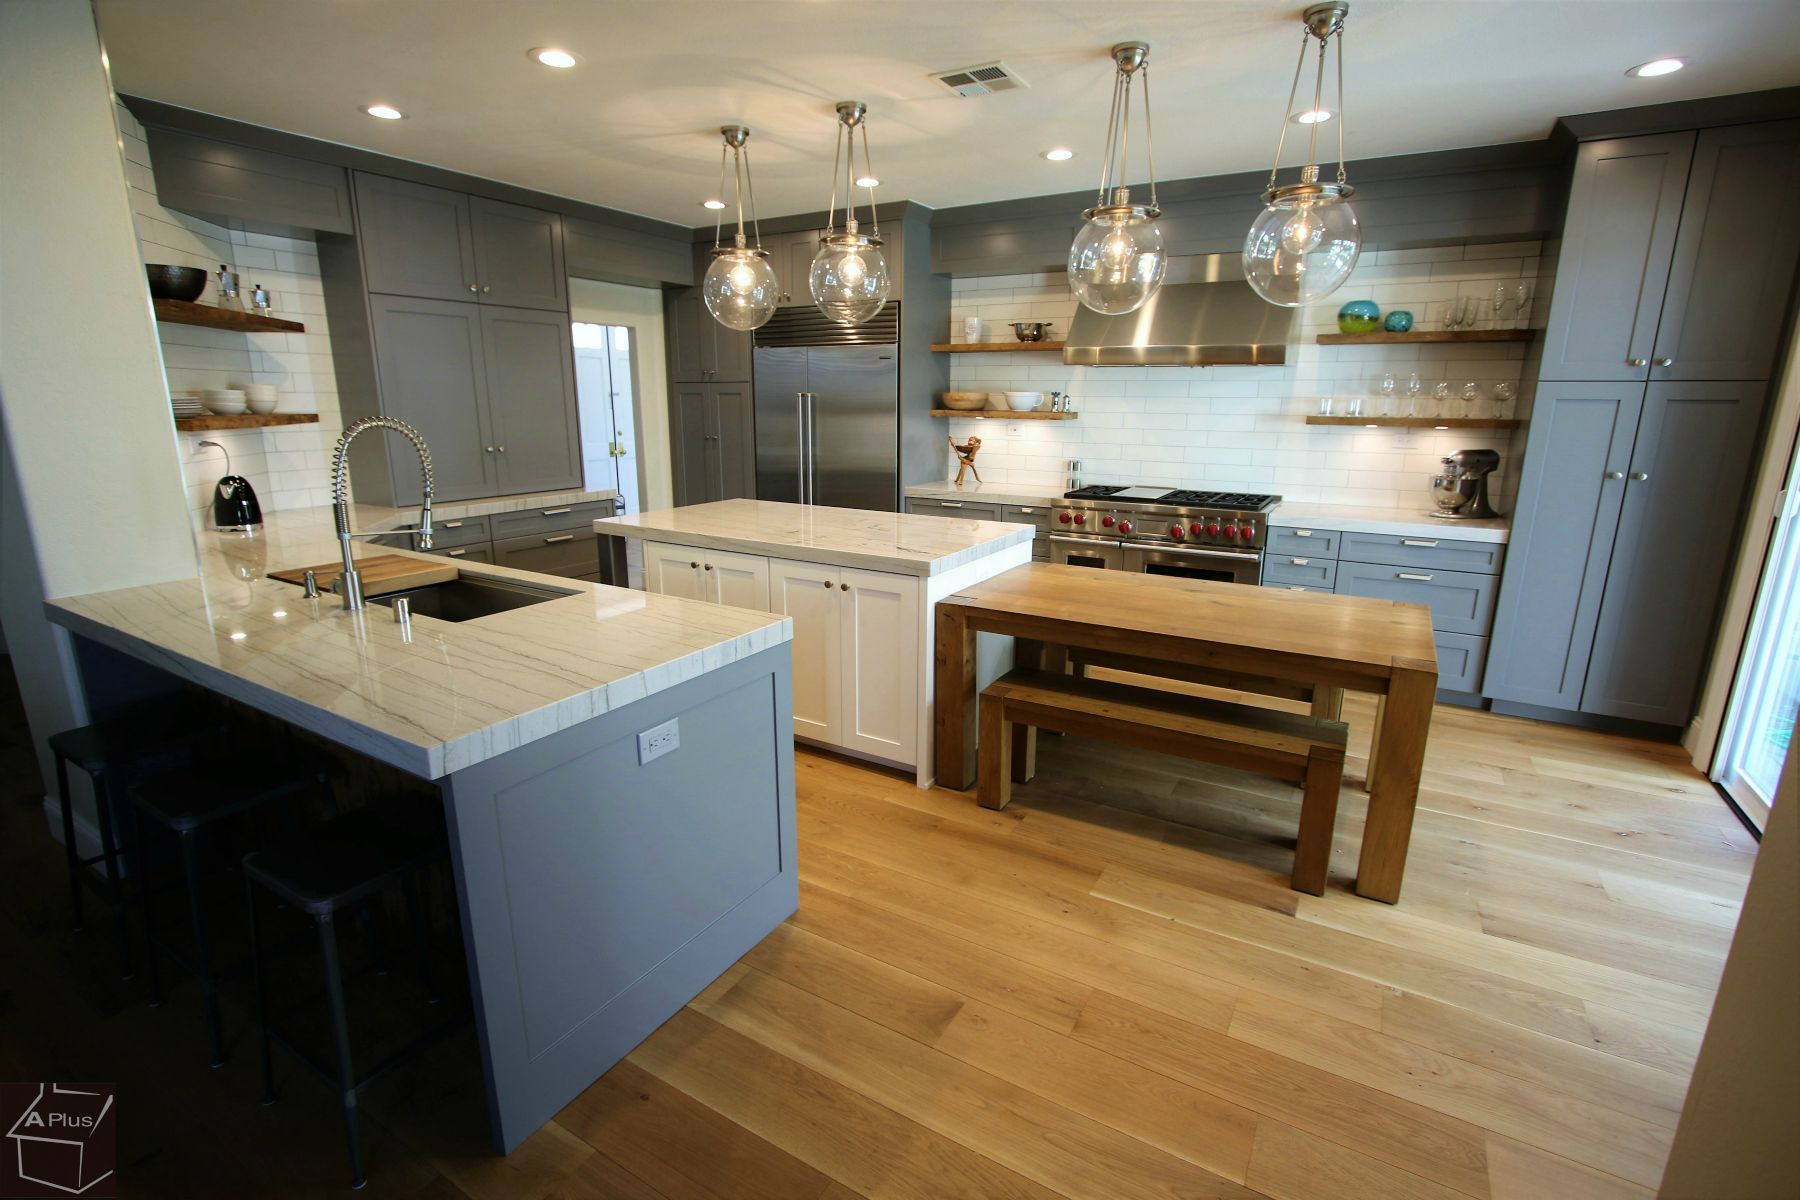 Aplus Interior Design Remodeling Industrial Style Kitchen